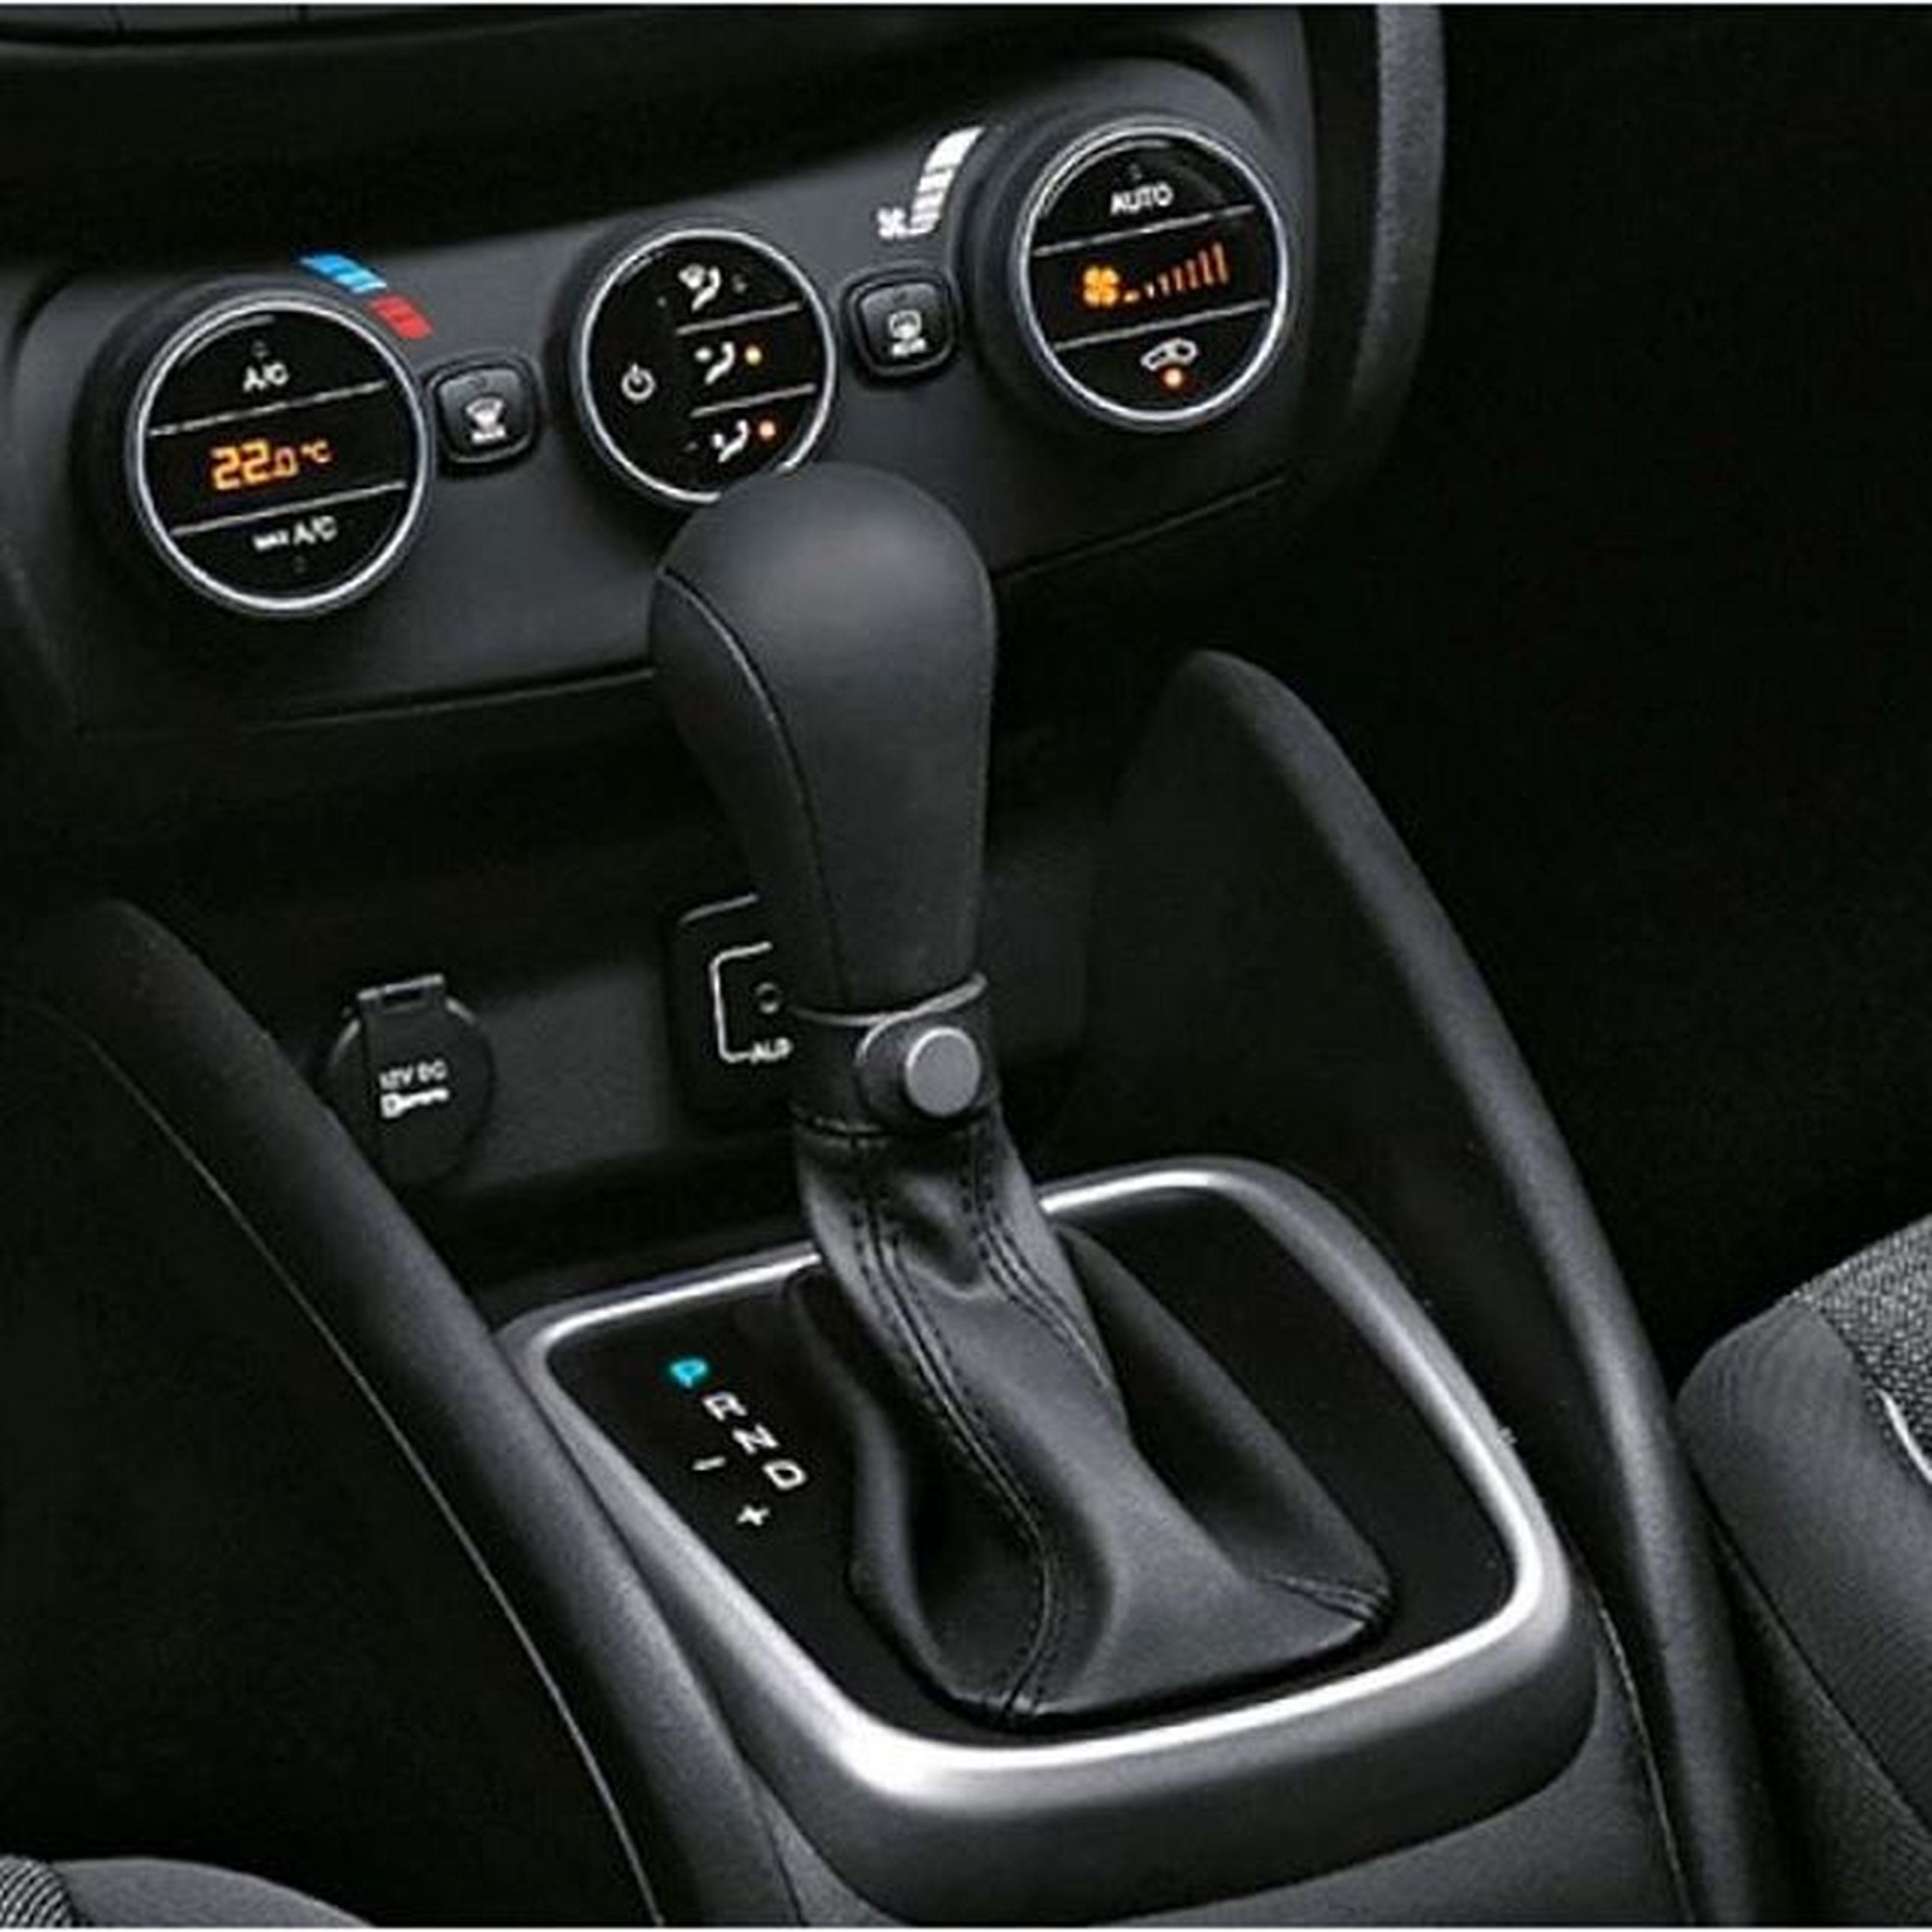 Fiat Egea 6 ileri çift kavrama otomatik vites Fiategea Fiat Egea ÇİFT kavrama Otomatikvites